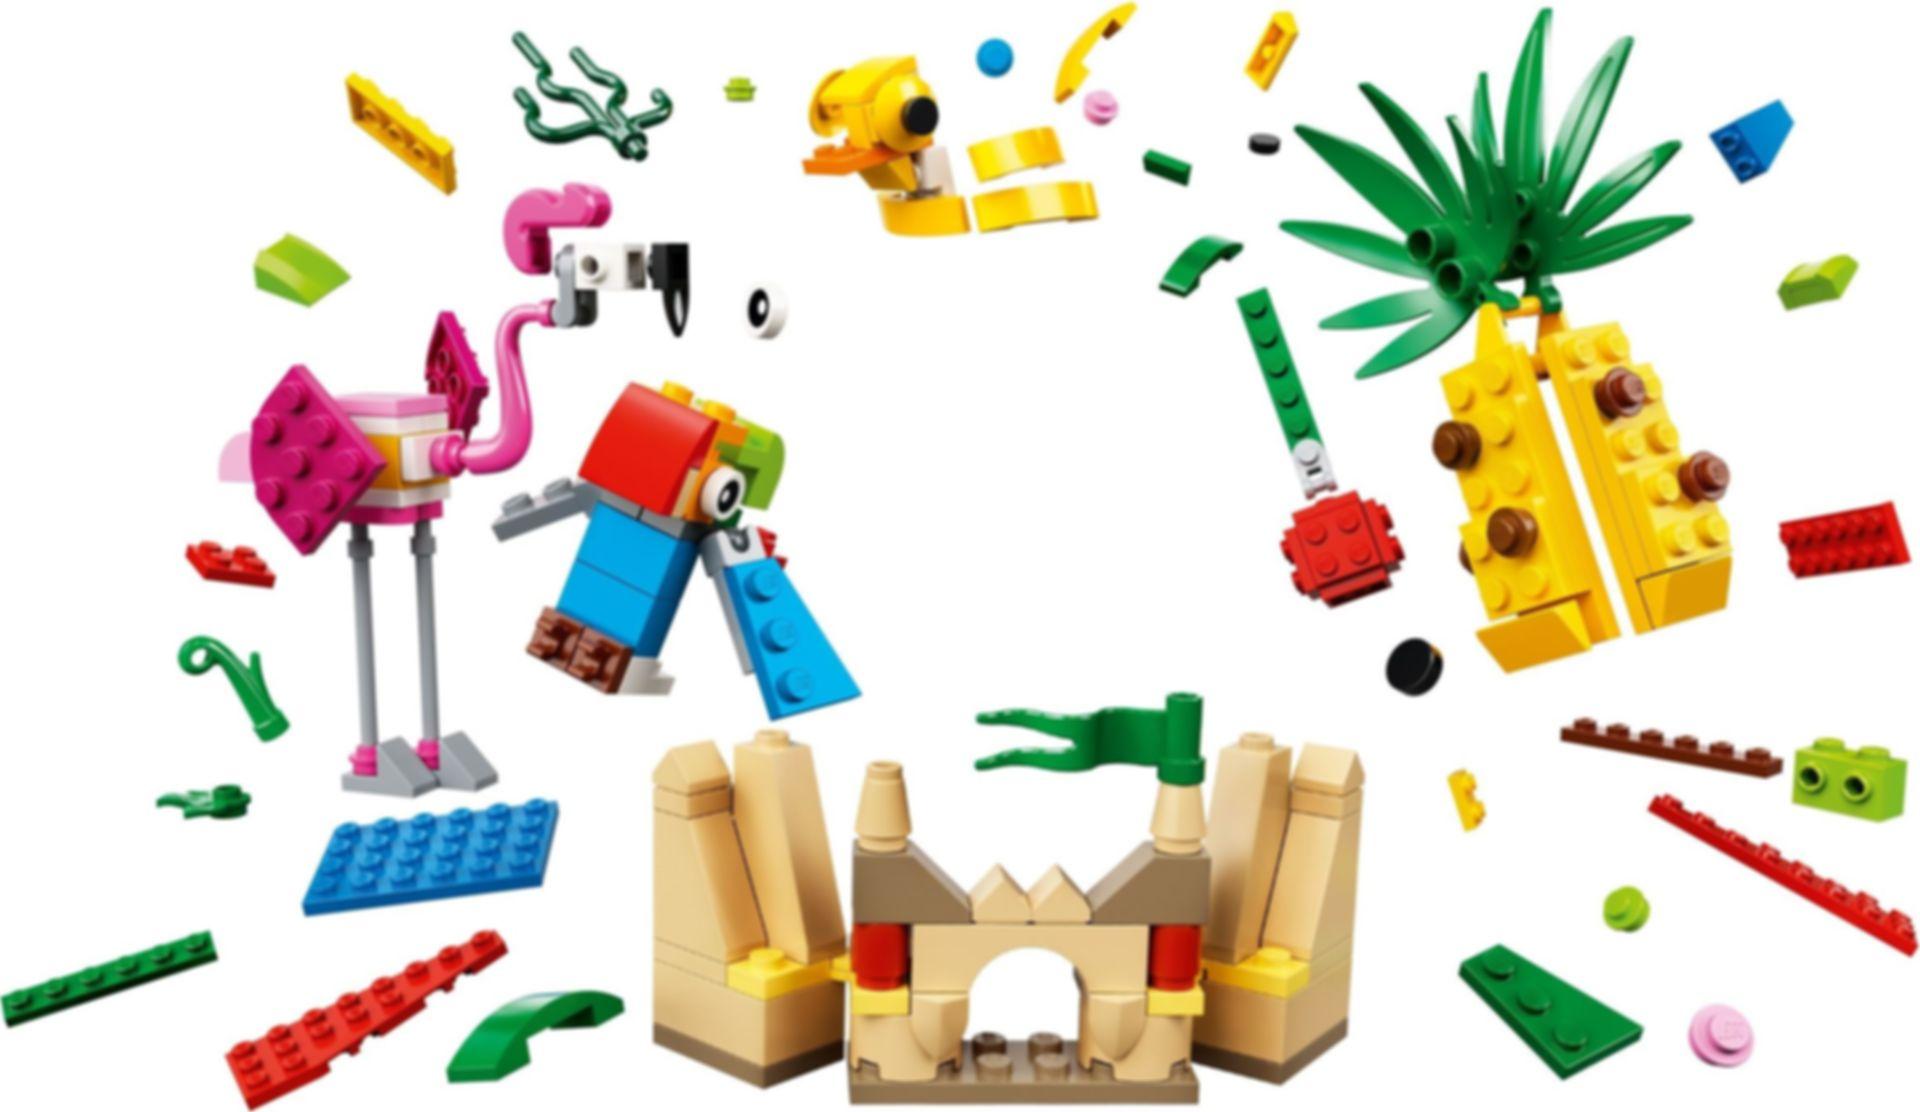 Creative Fun 12-in-1 components